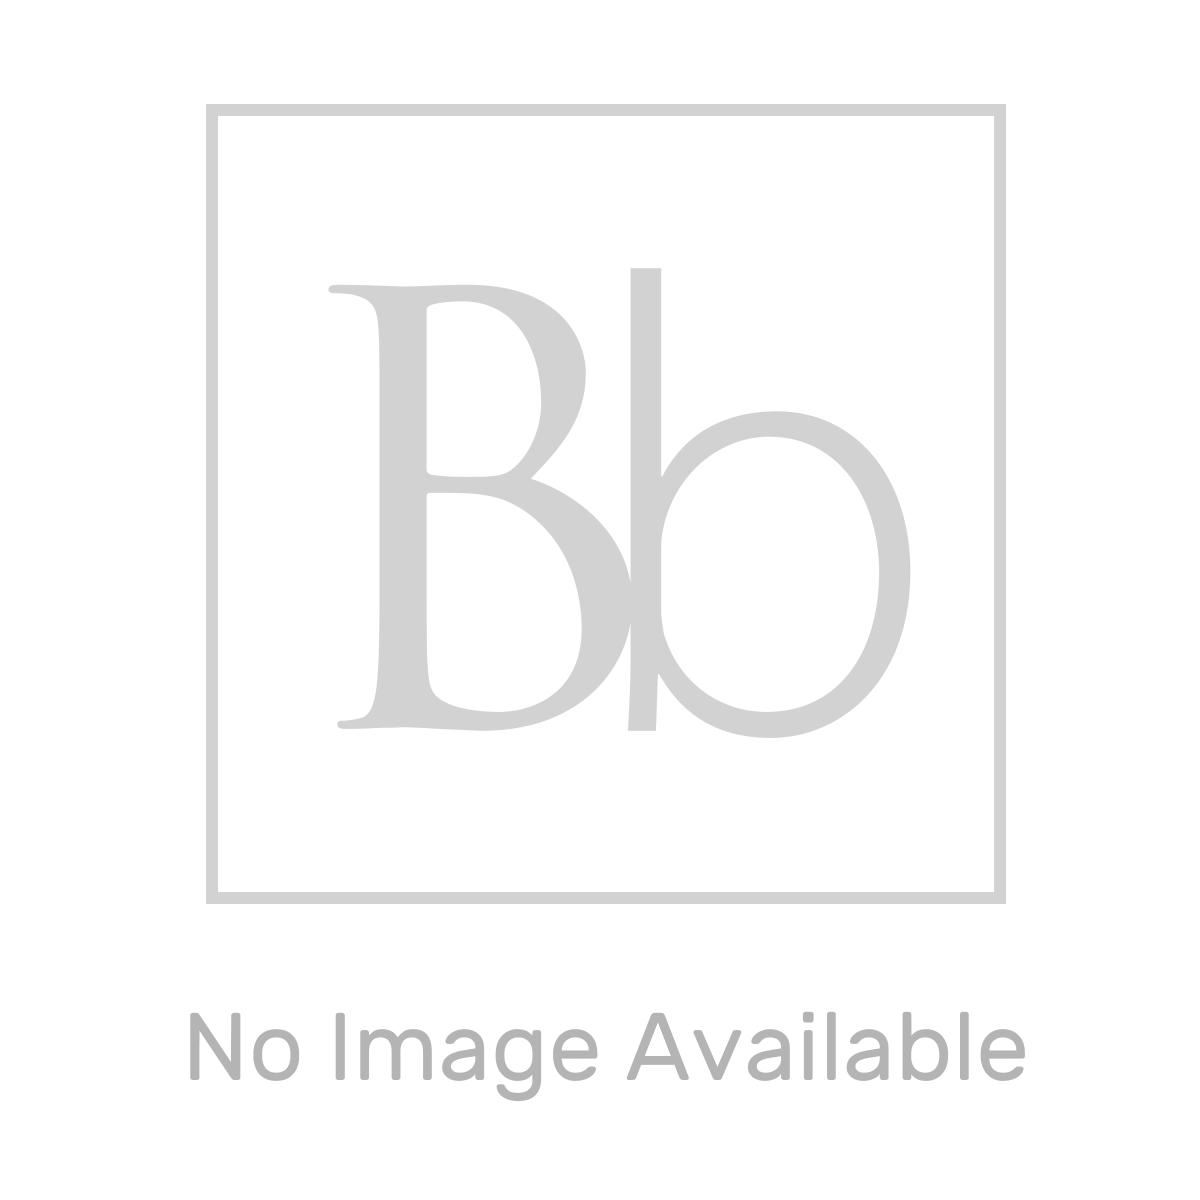 RAK Surface Greige Rustic Tile 600 x 600mm